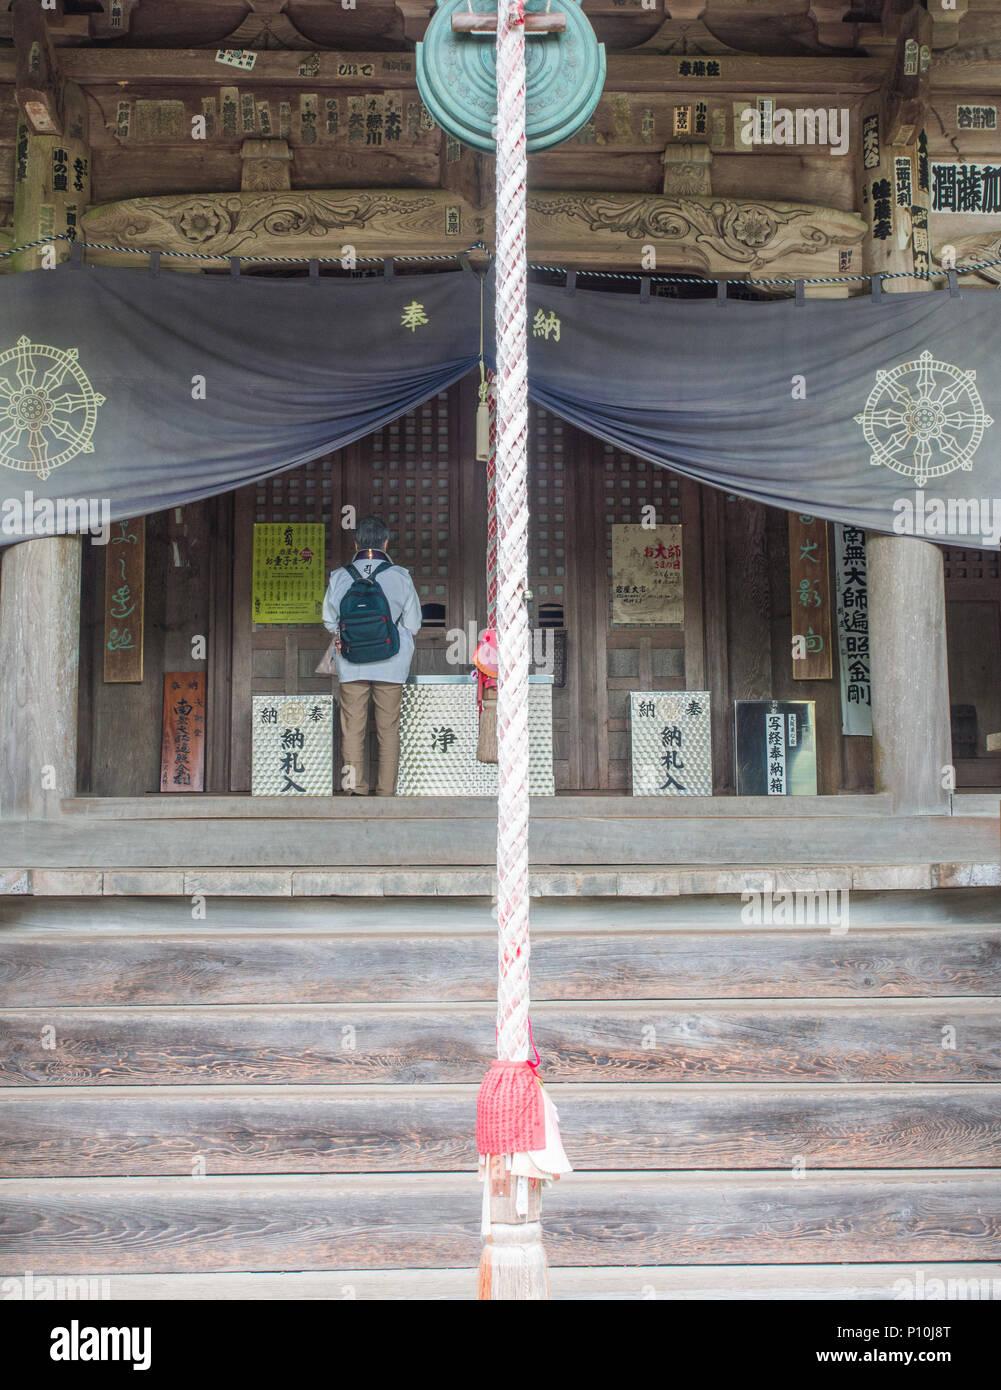 Pèlerin henro Bell corde avec adoration à Iwayaji 45 Temple, Temple 88 Shikoku pèlerinage, Ehime, au Japon Photo Stock